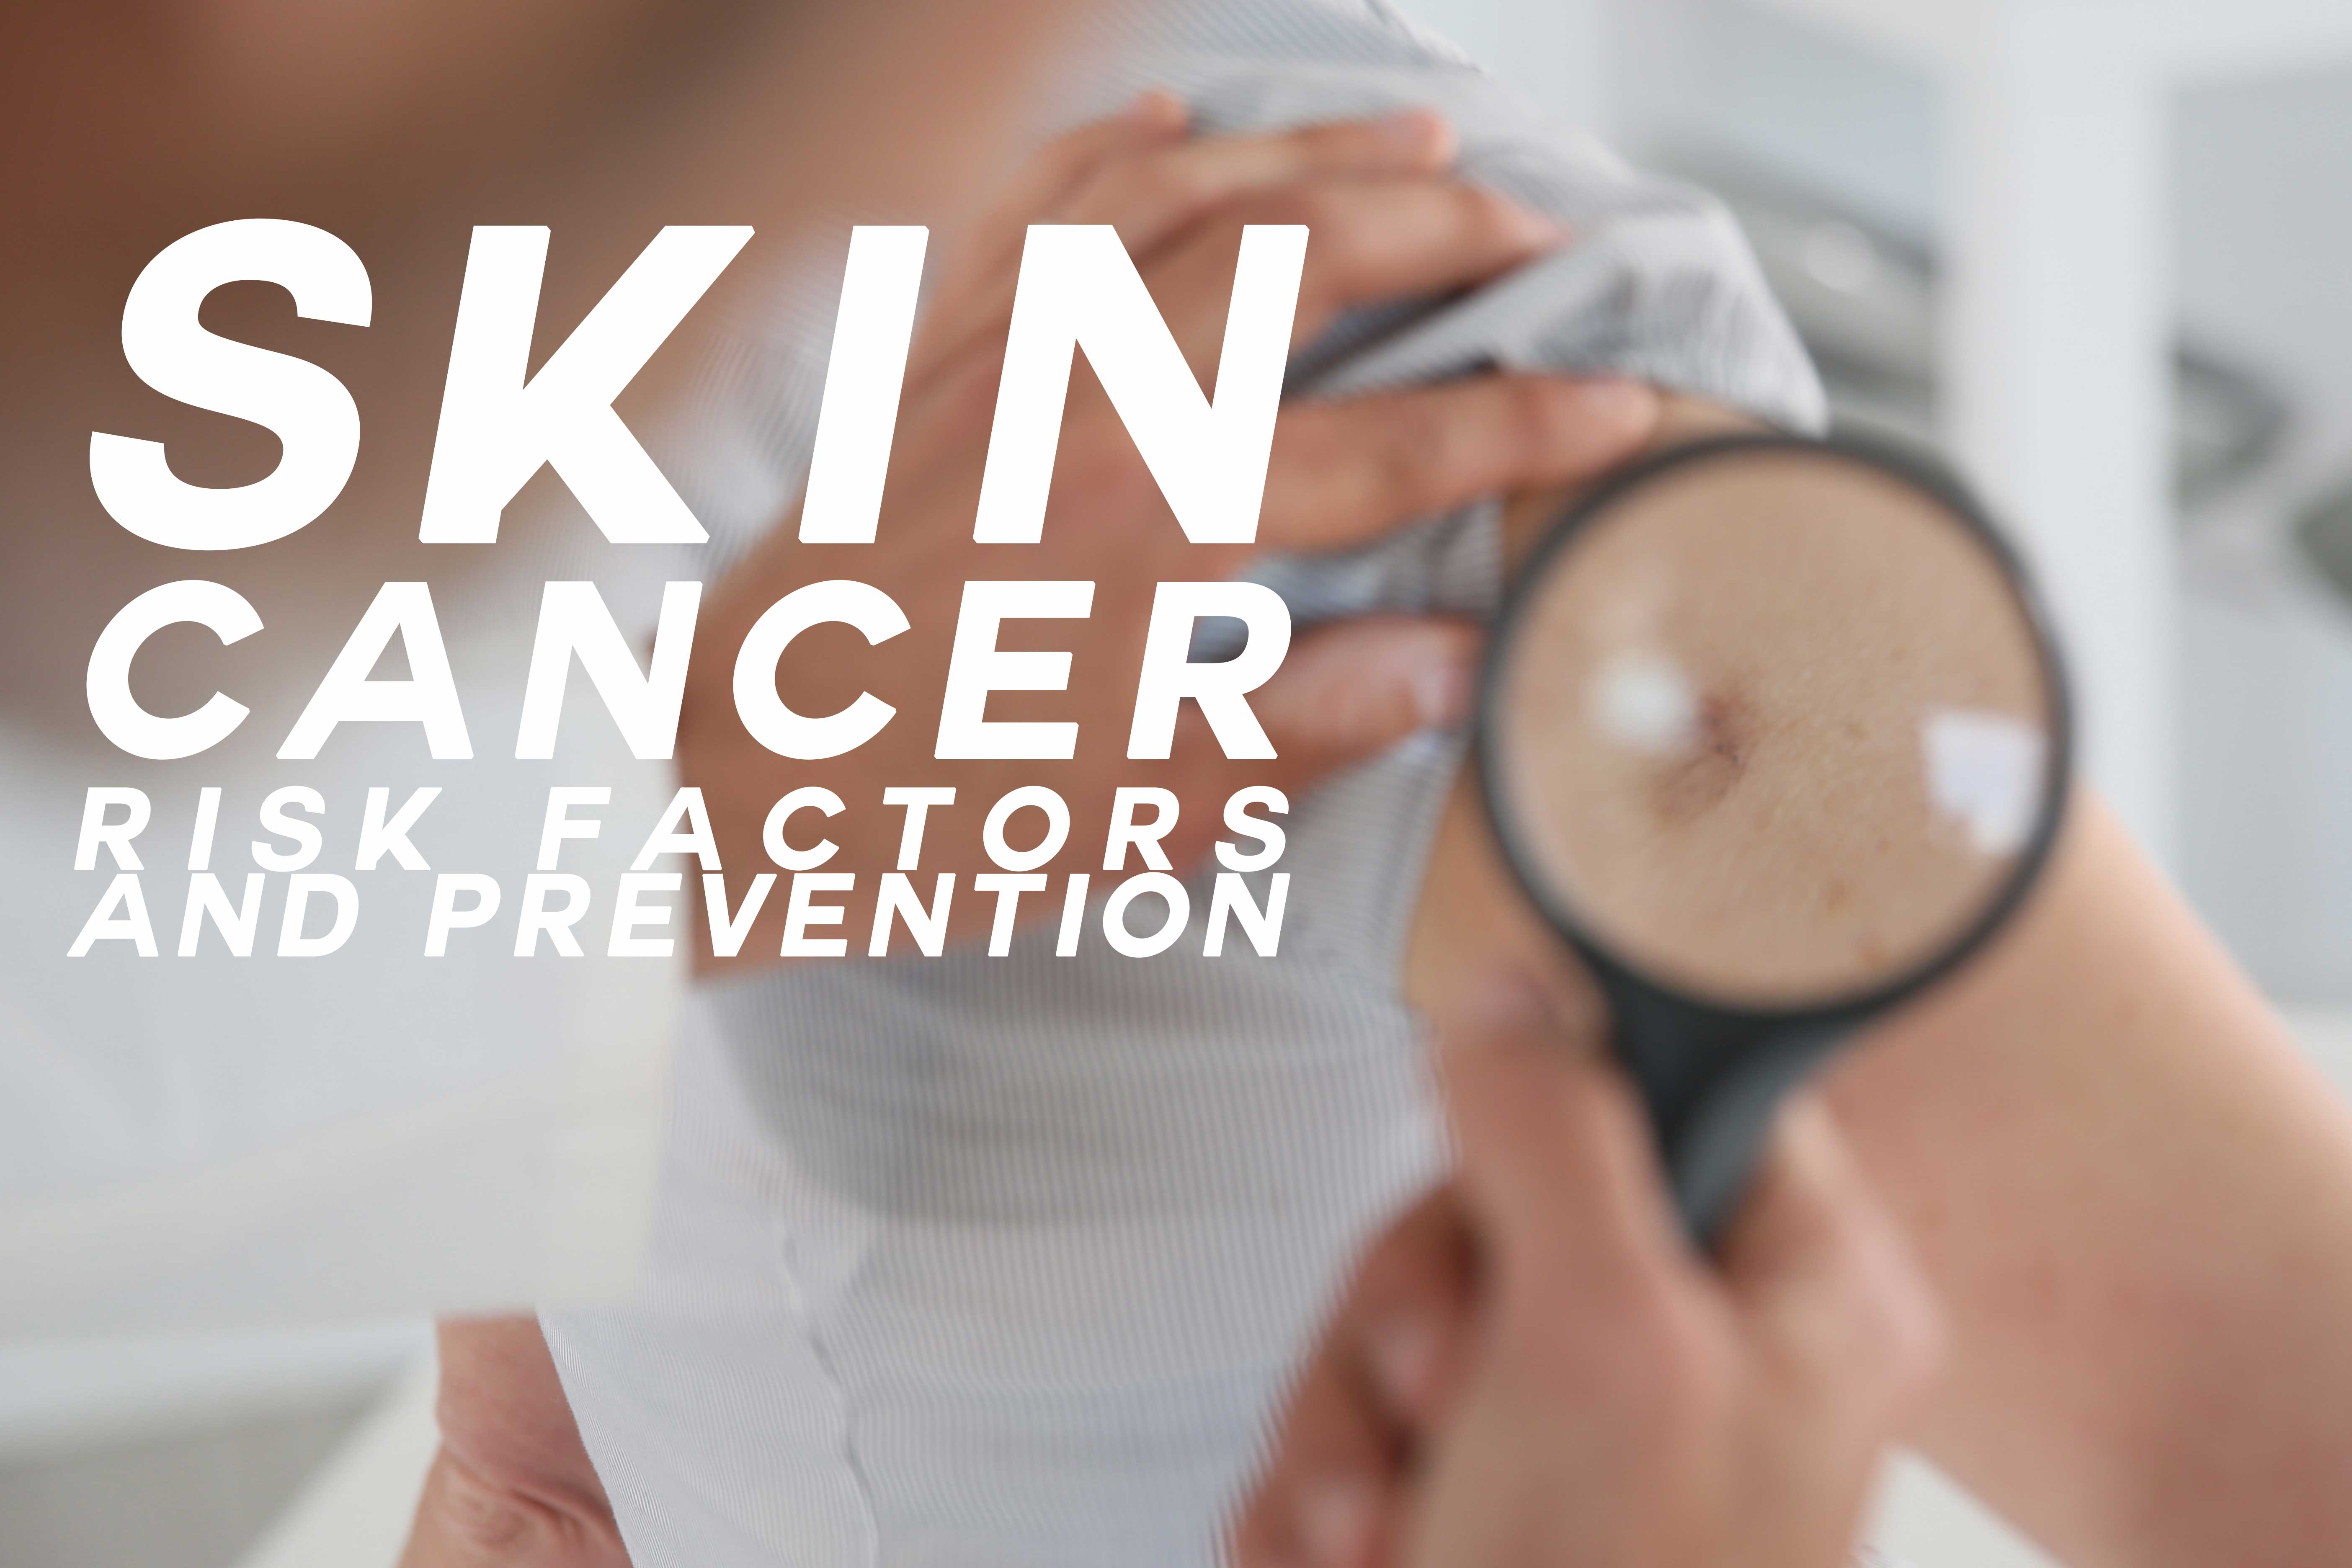 Skin Cancer Risk Factors and Prevention